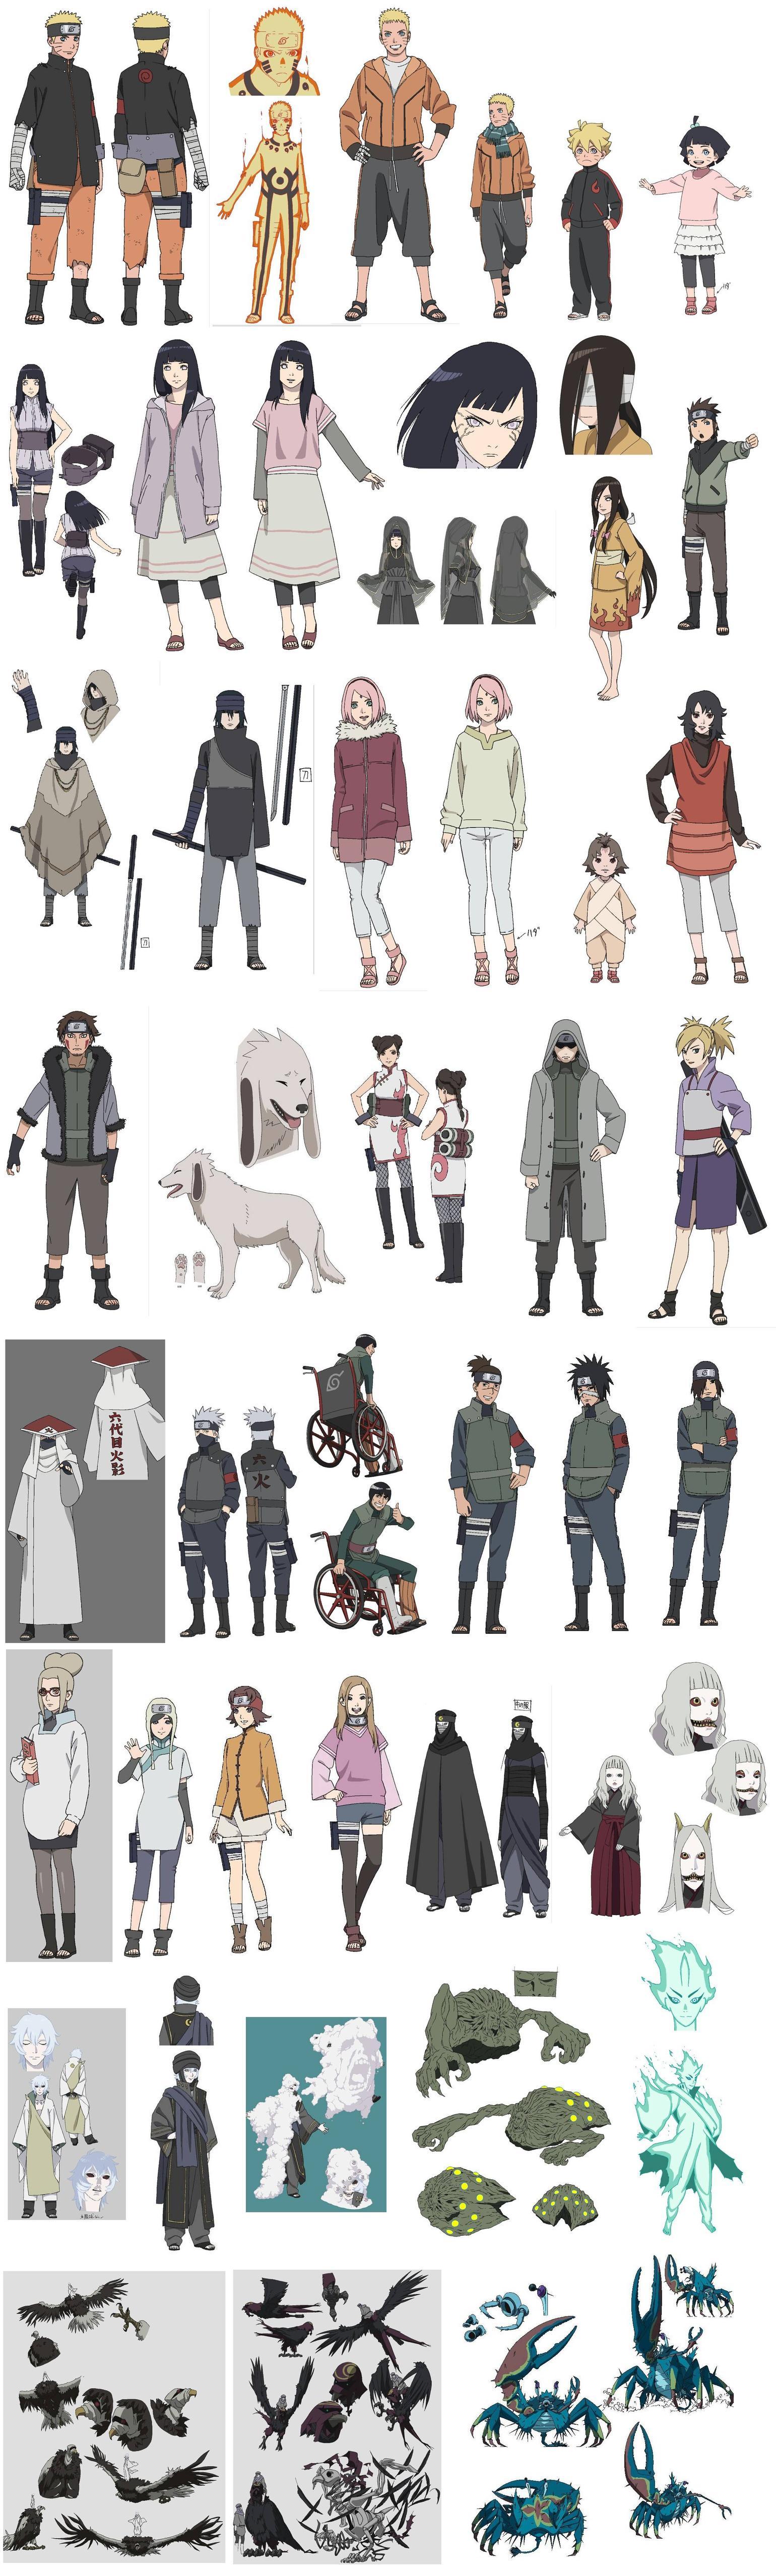 [Manga] Naruto / Shippuden (Risques de spoil) - Page 9 1415185046-dyi5obv